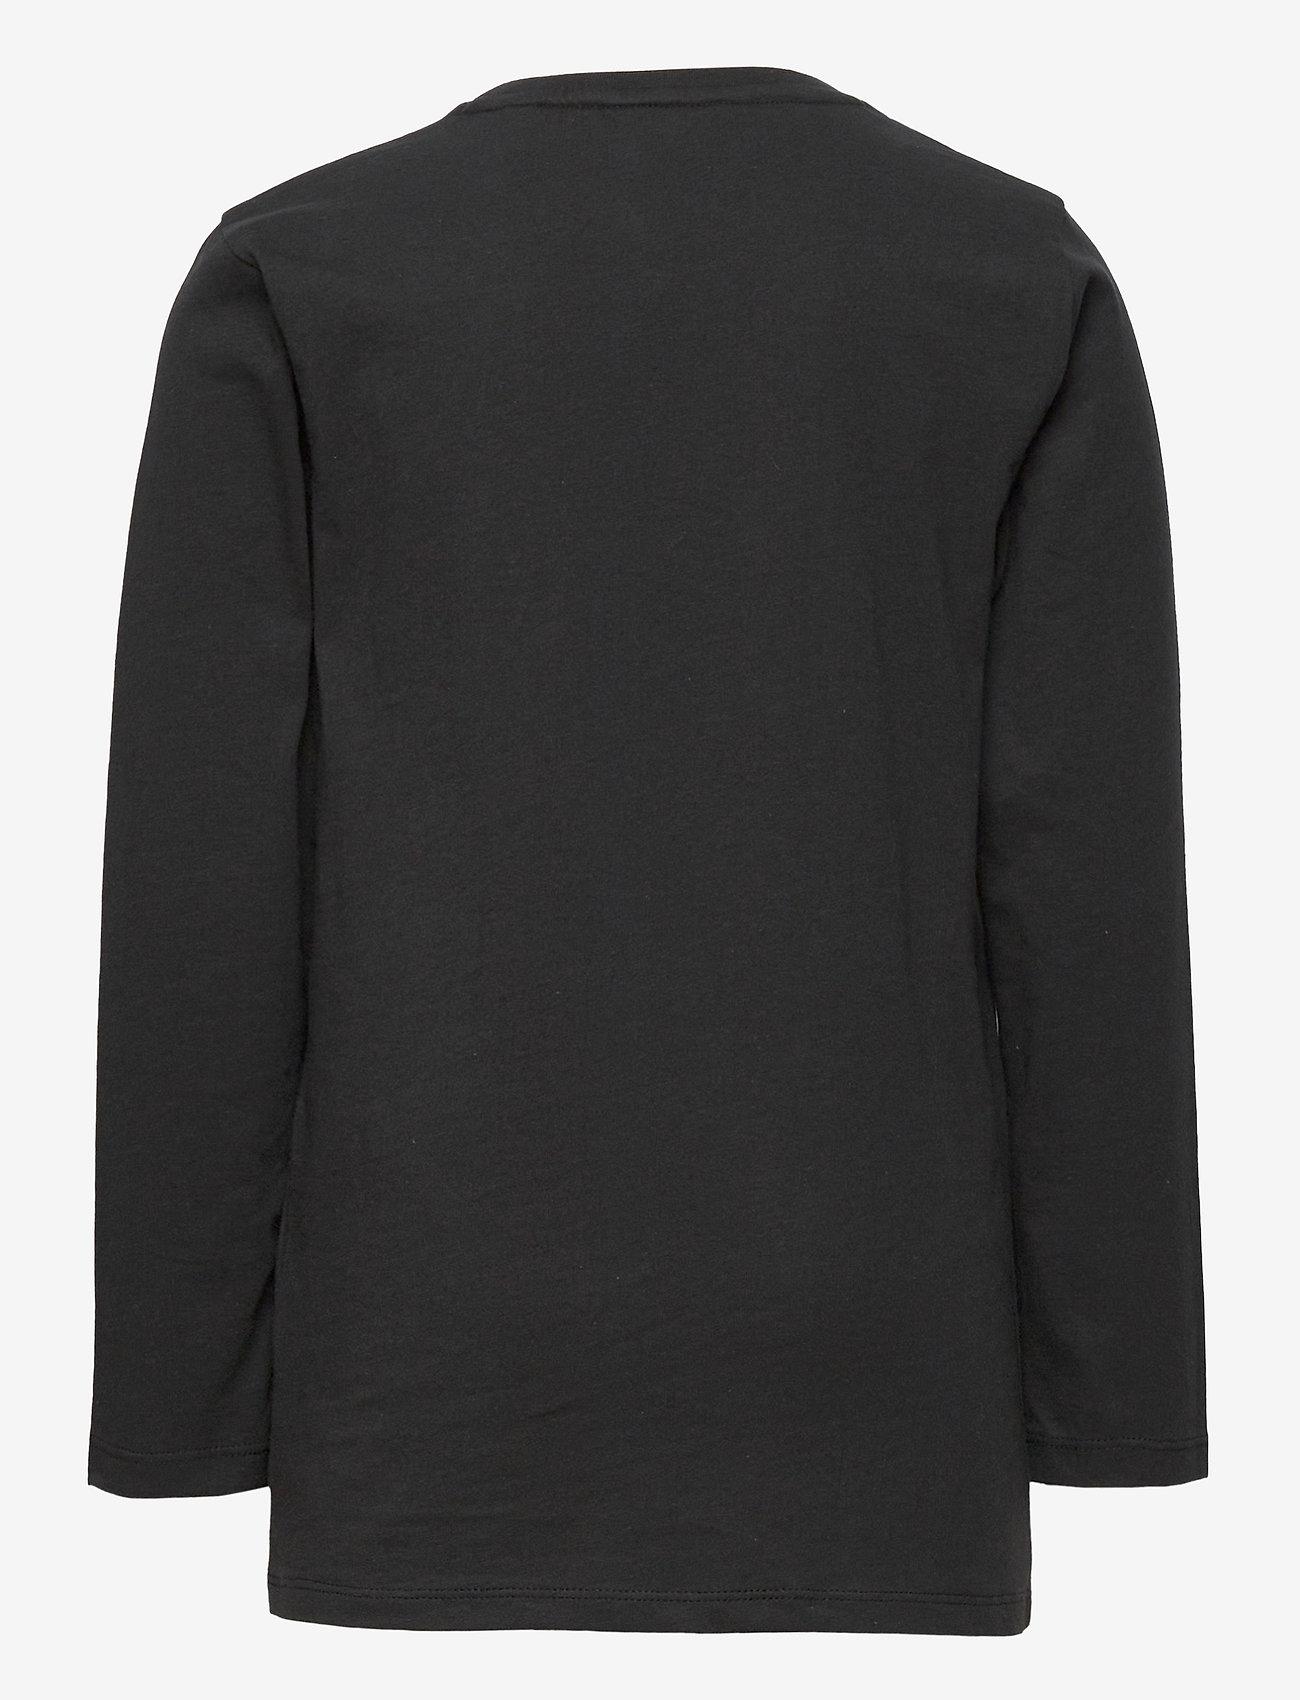 GANT - GANT LOCK-UP LS T-SHIRT - long-sleeved t-shirts - black - 1